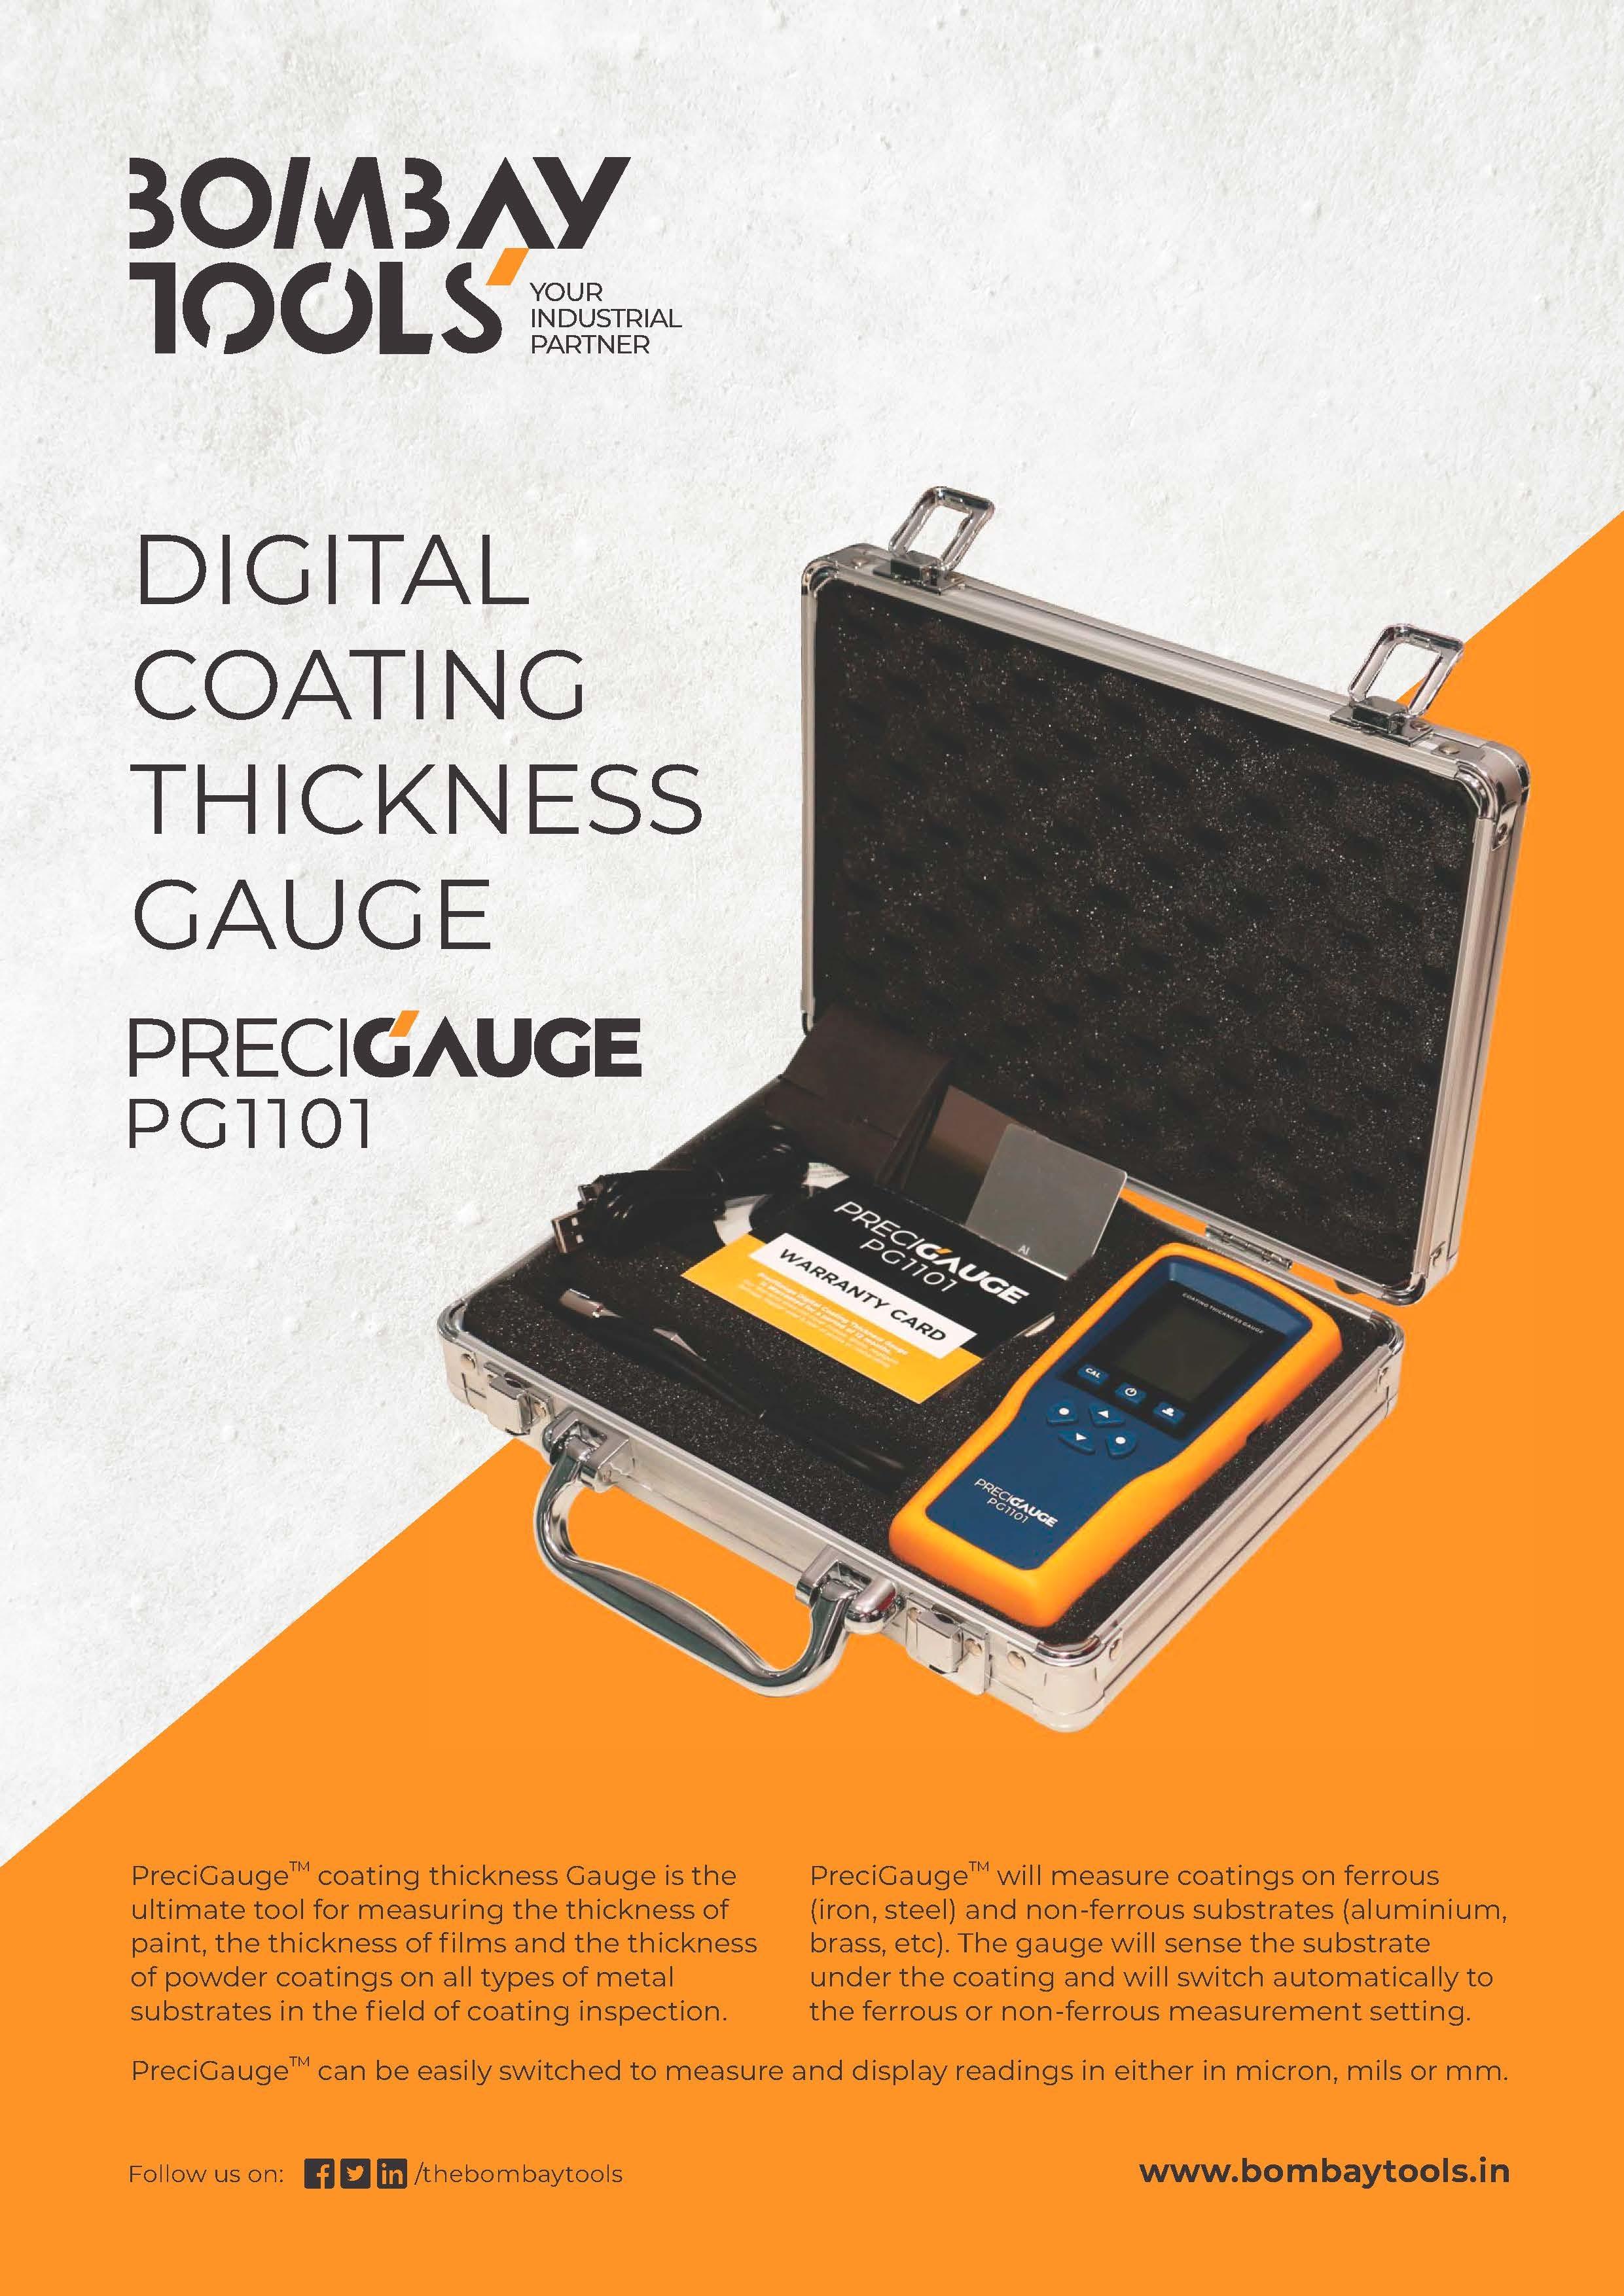 PreciGauge Digital Coating Thickness Gauge